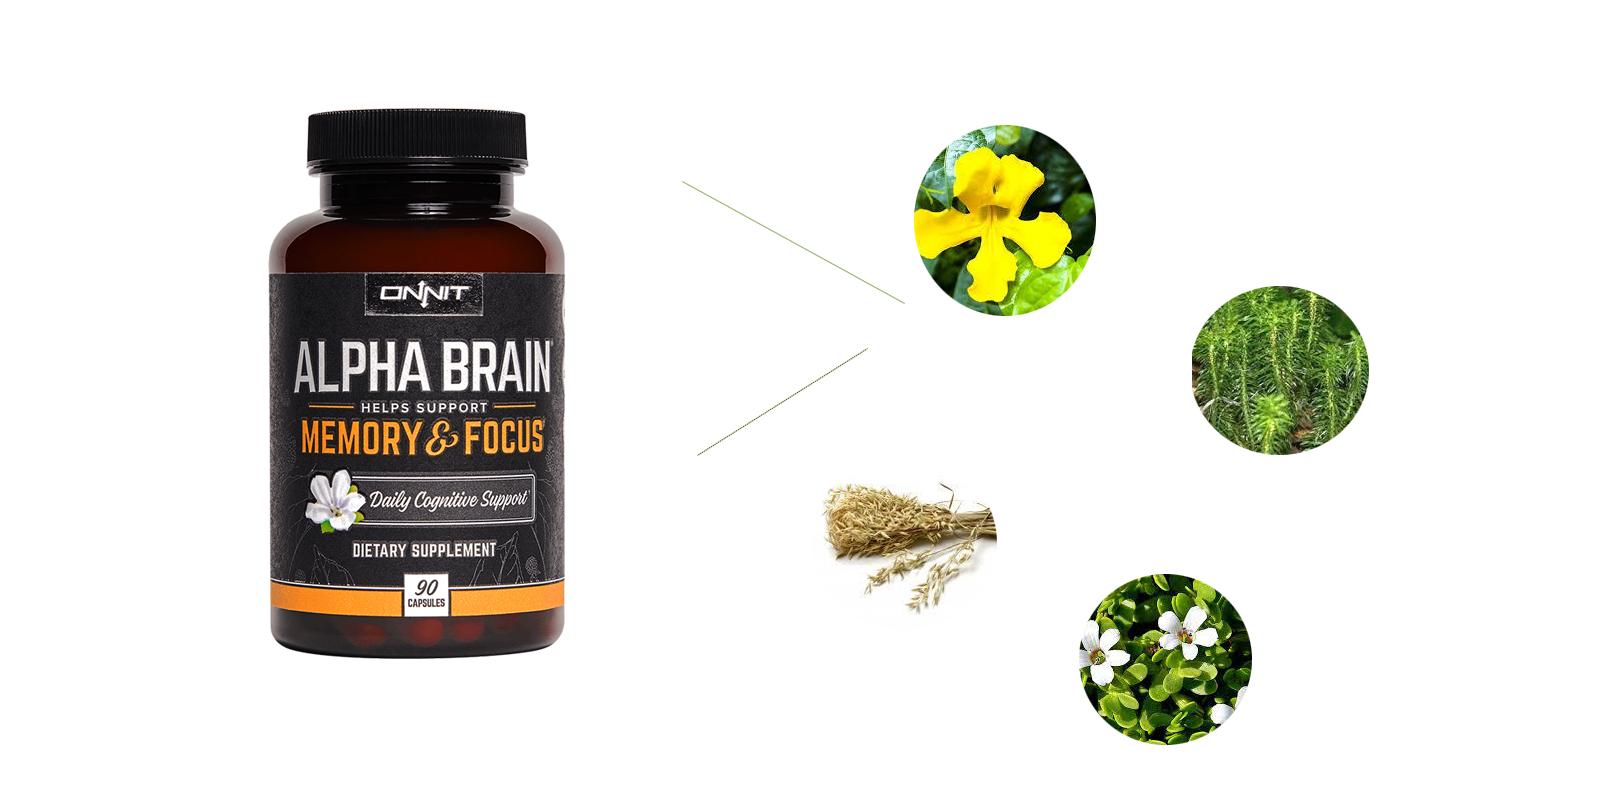 Onnit Alpha Brain Reviews-ingredients